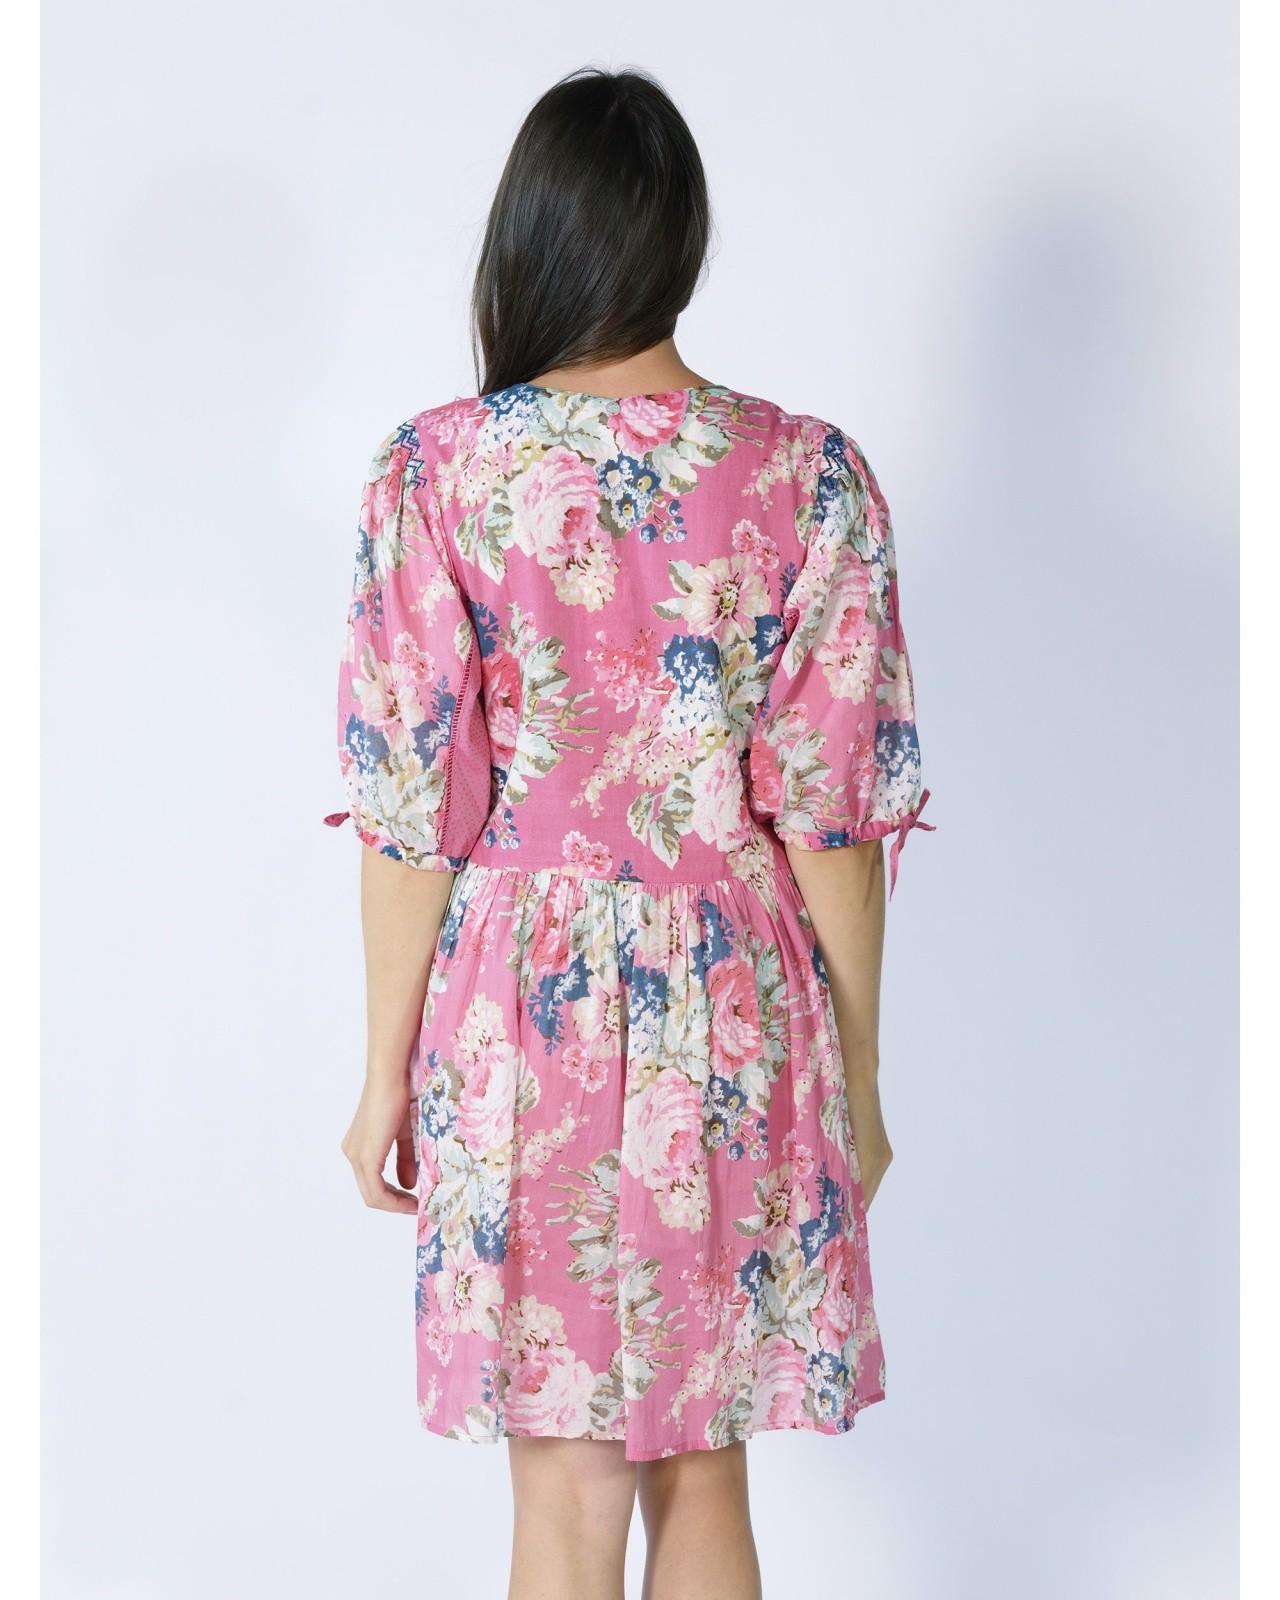 Rhum Raisin pink dress, Valensole 69